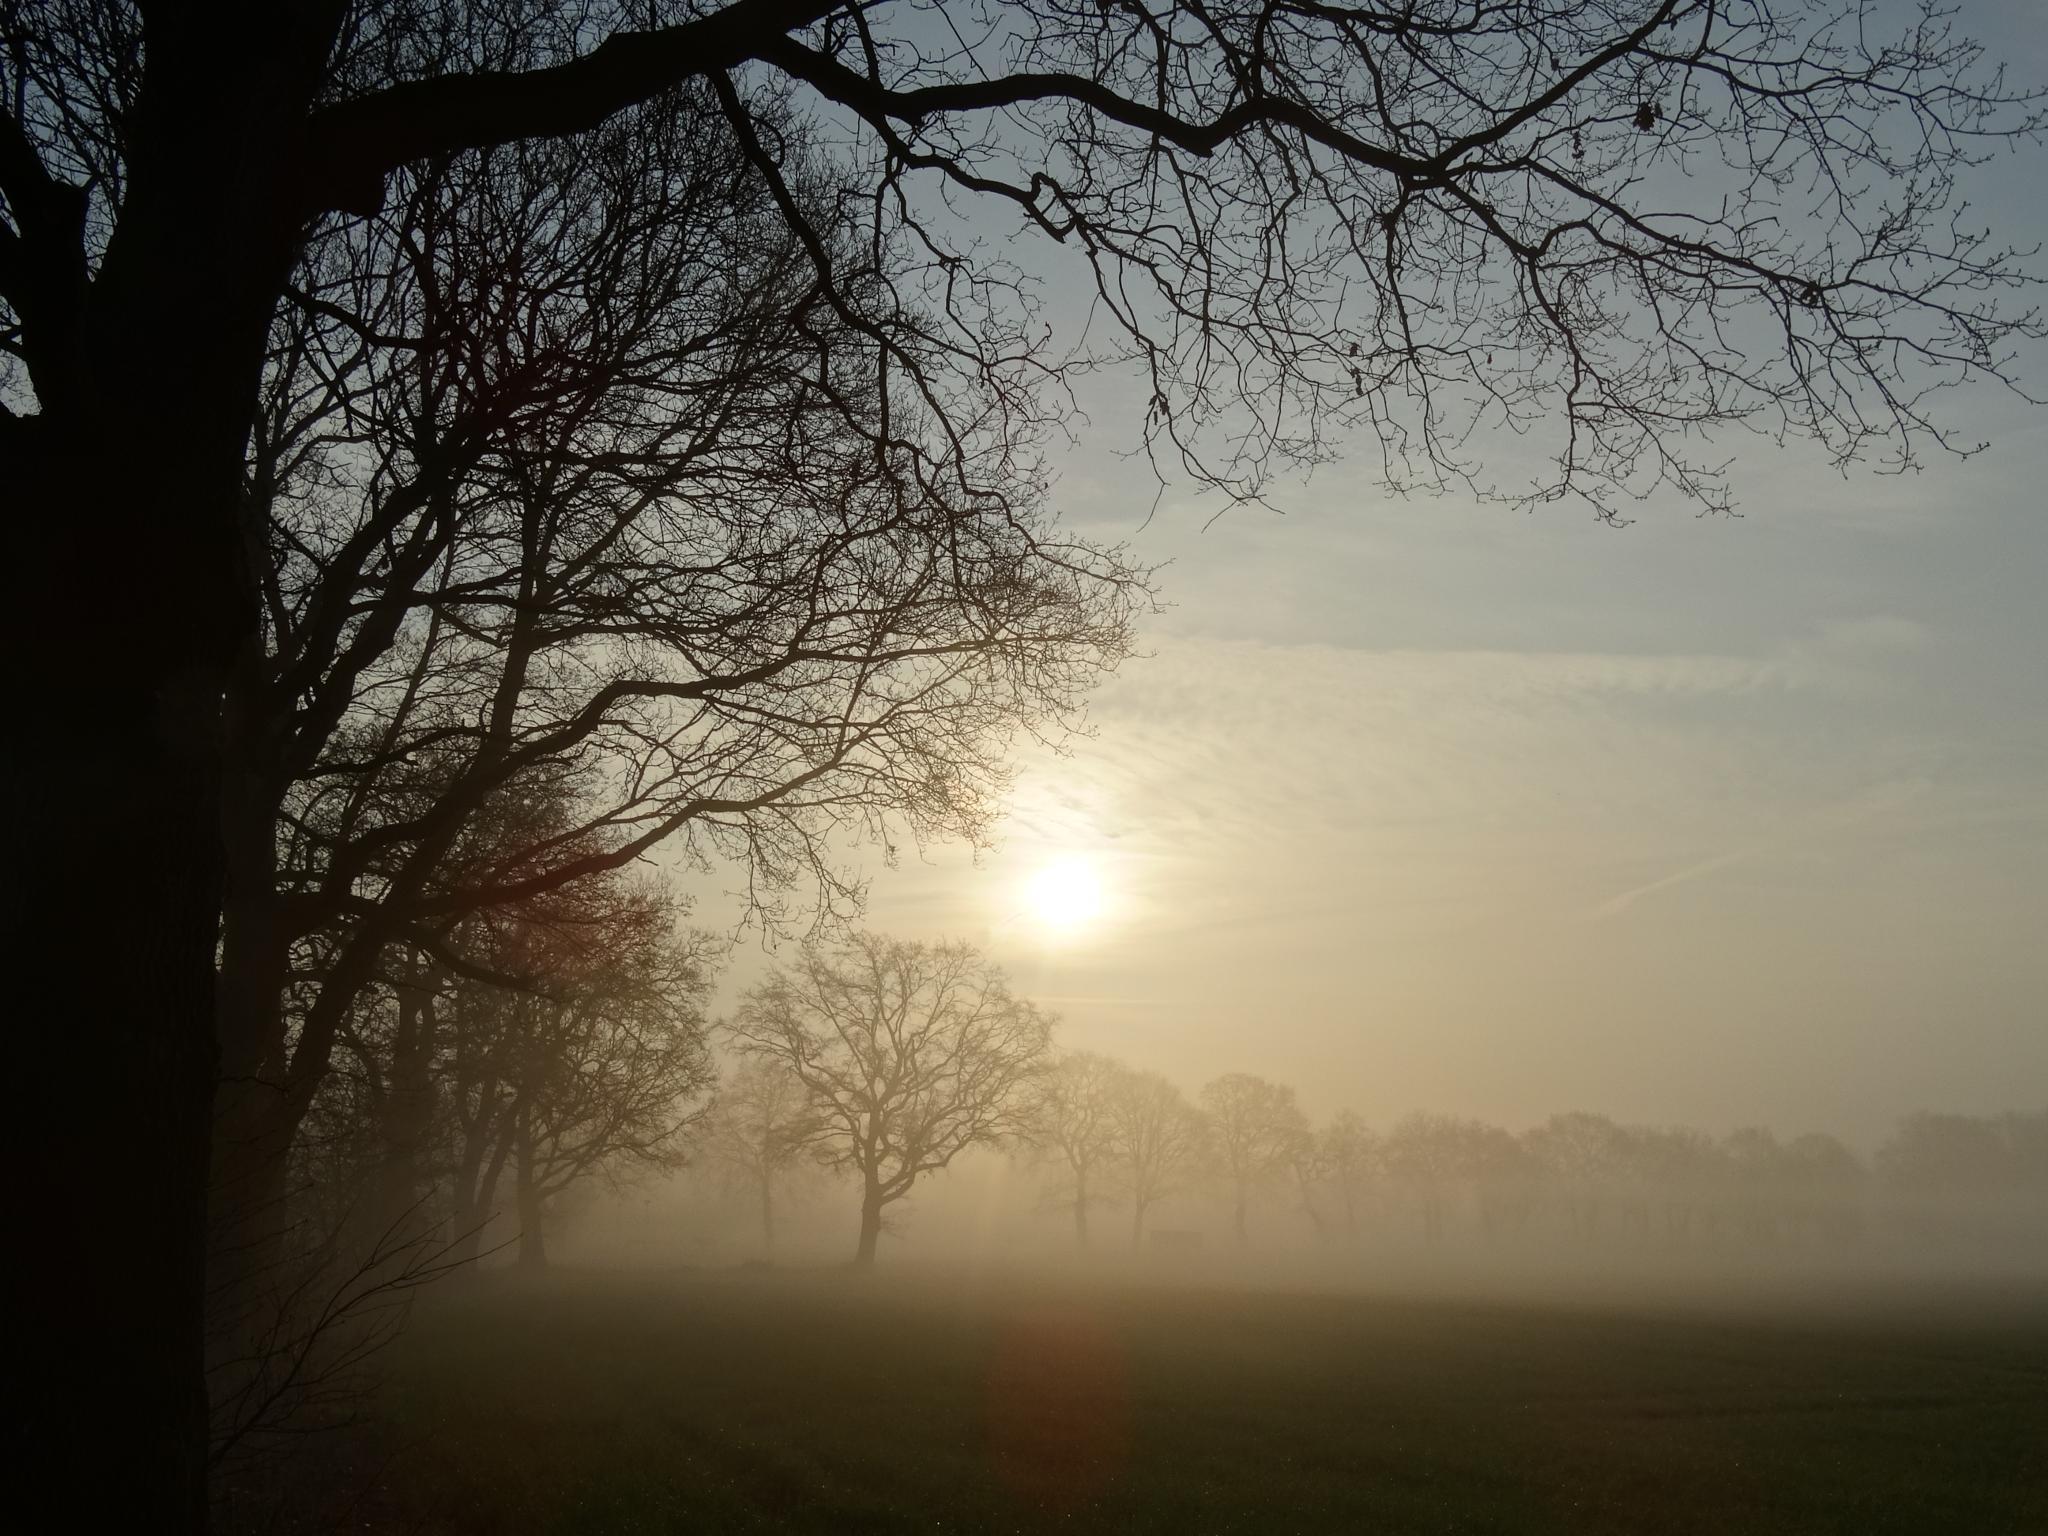 Foggy morning by GertdeVos